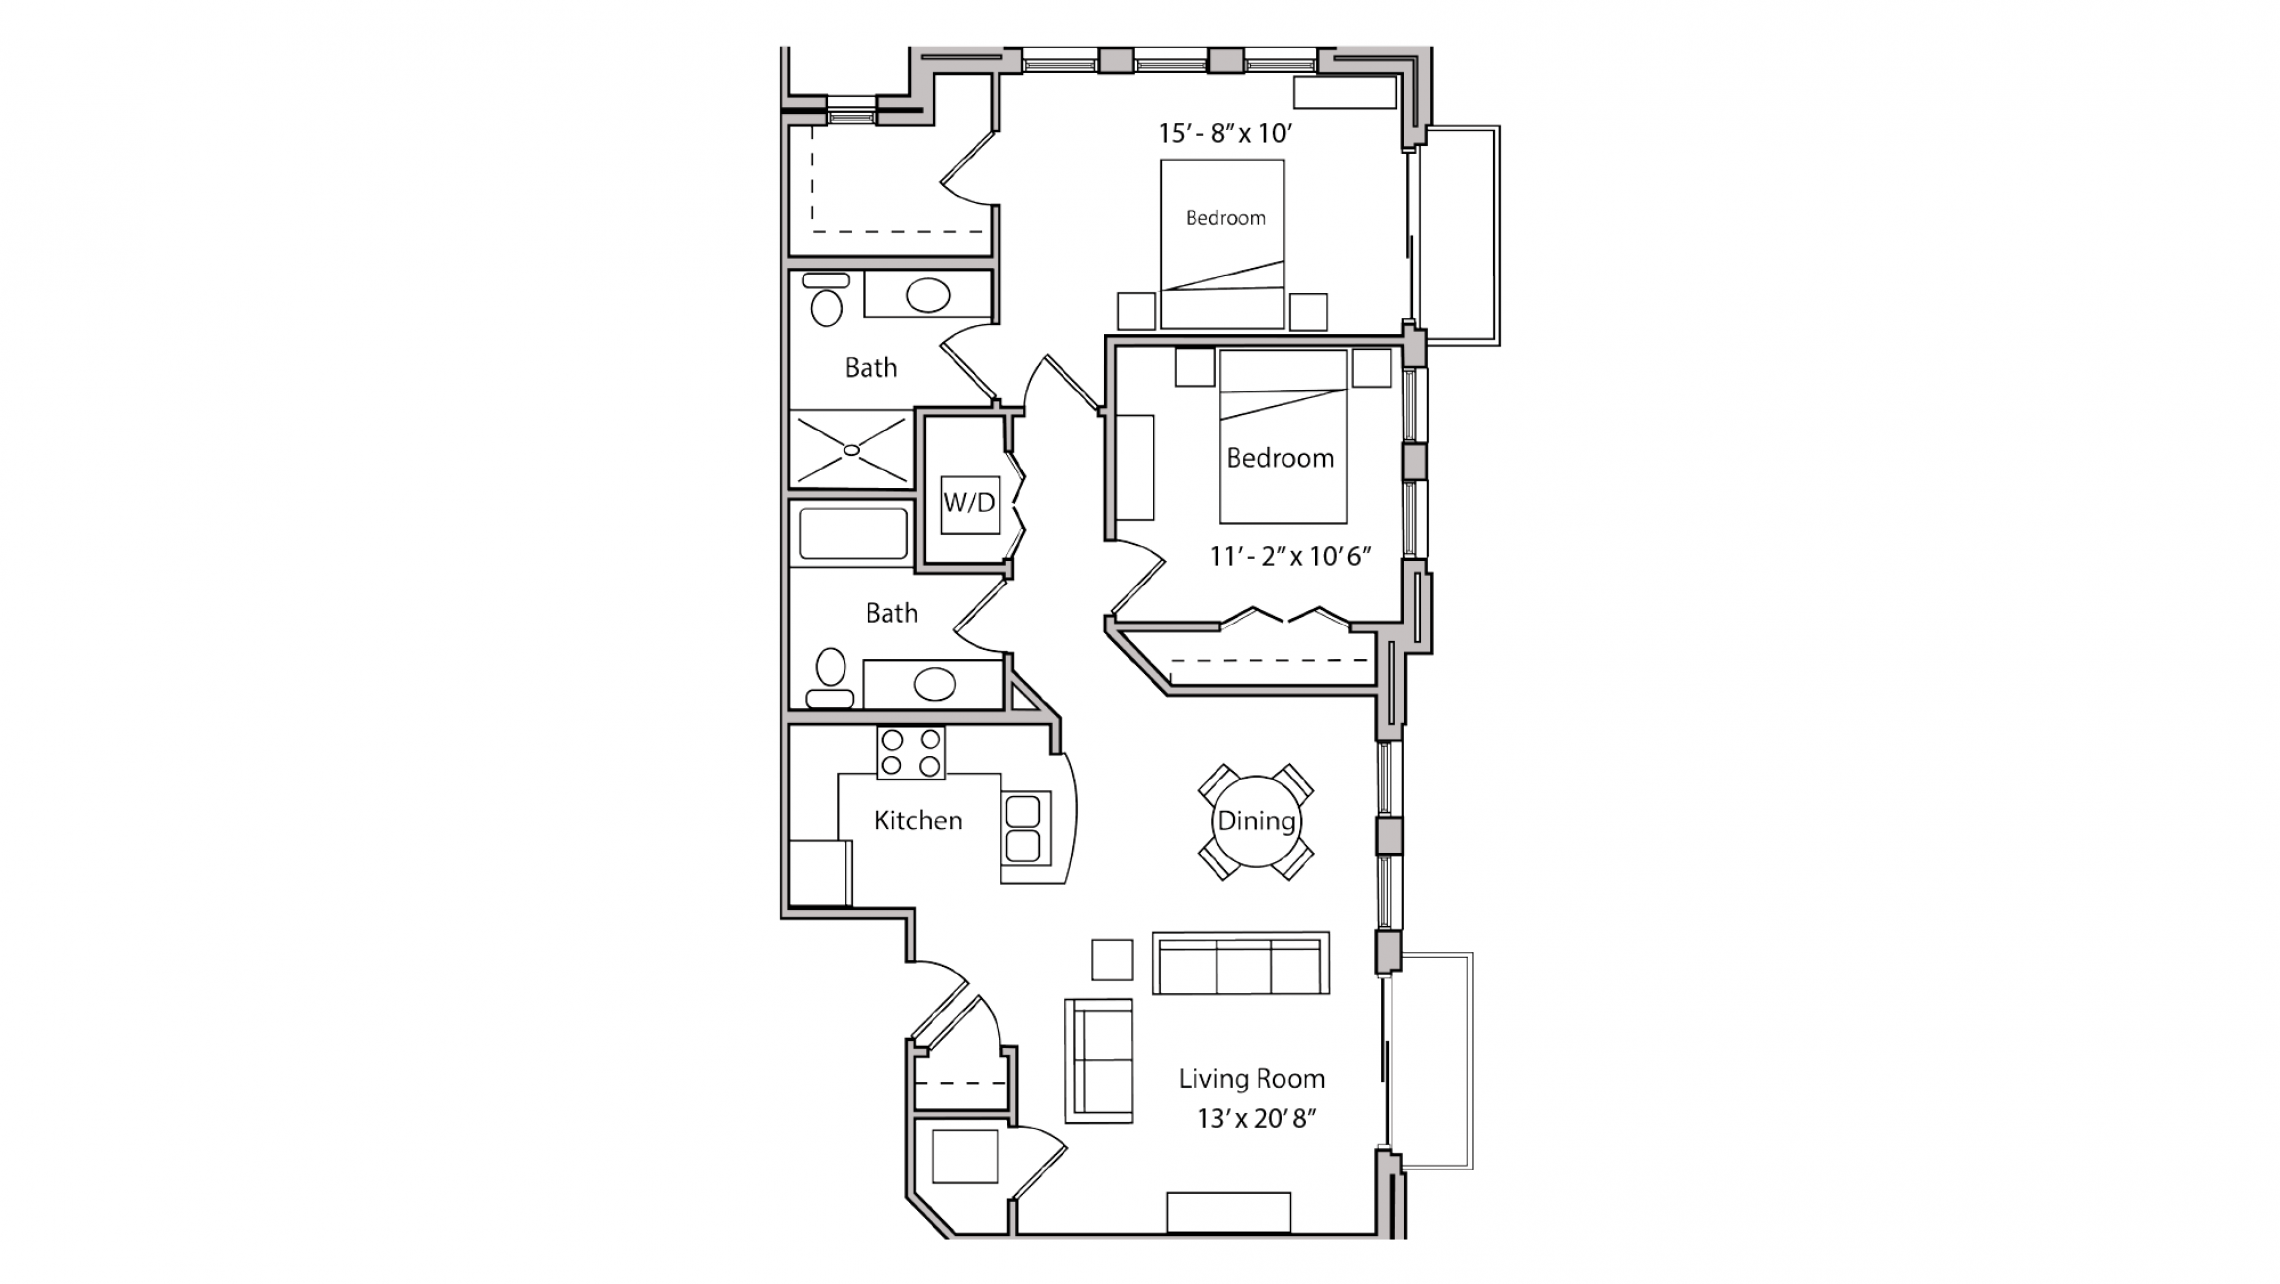 ULI The Depot 2-311 - Two Bedroom, Two Bathroom